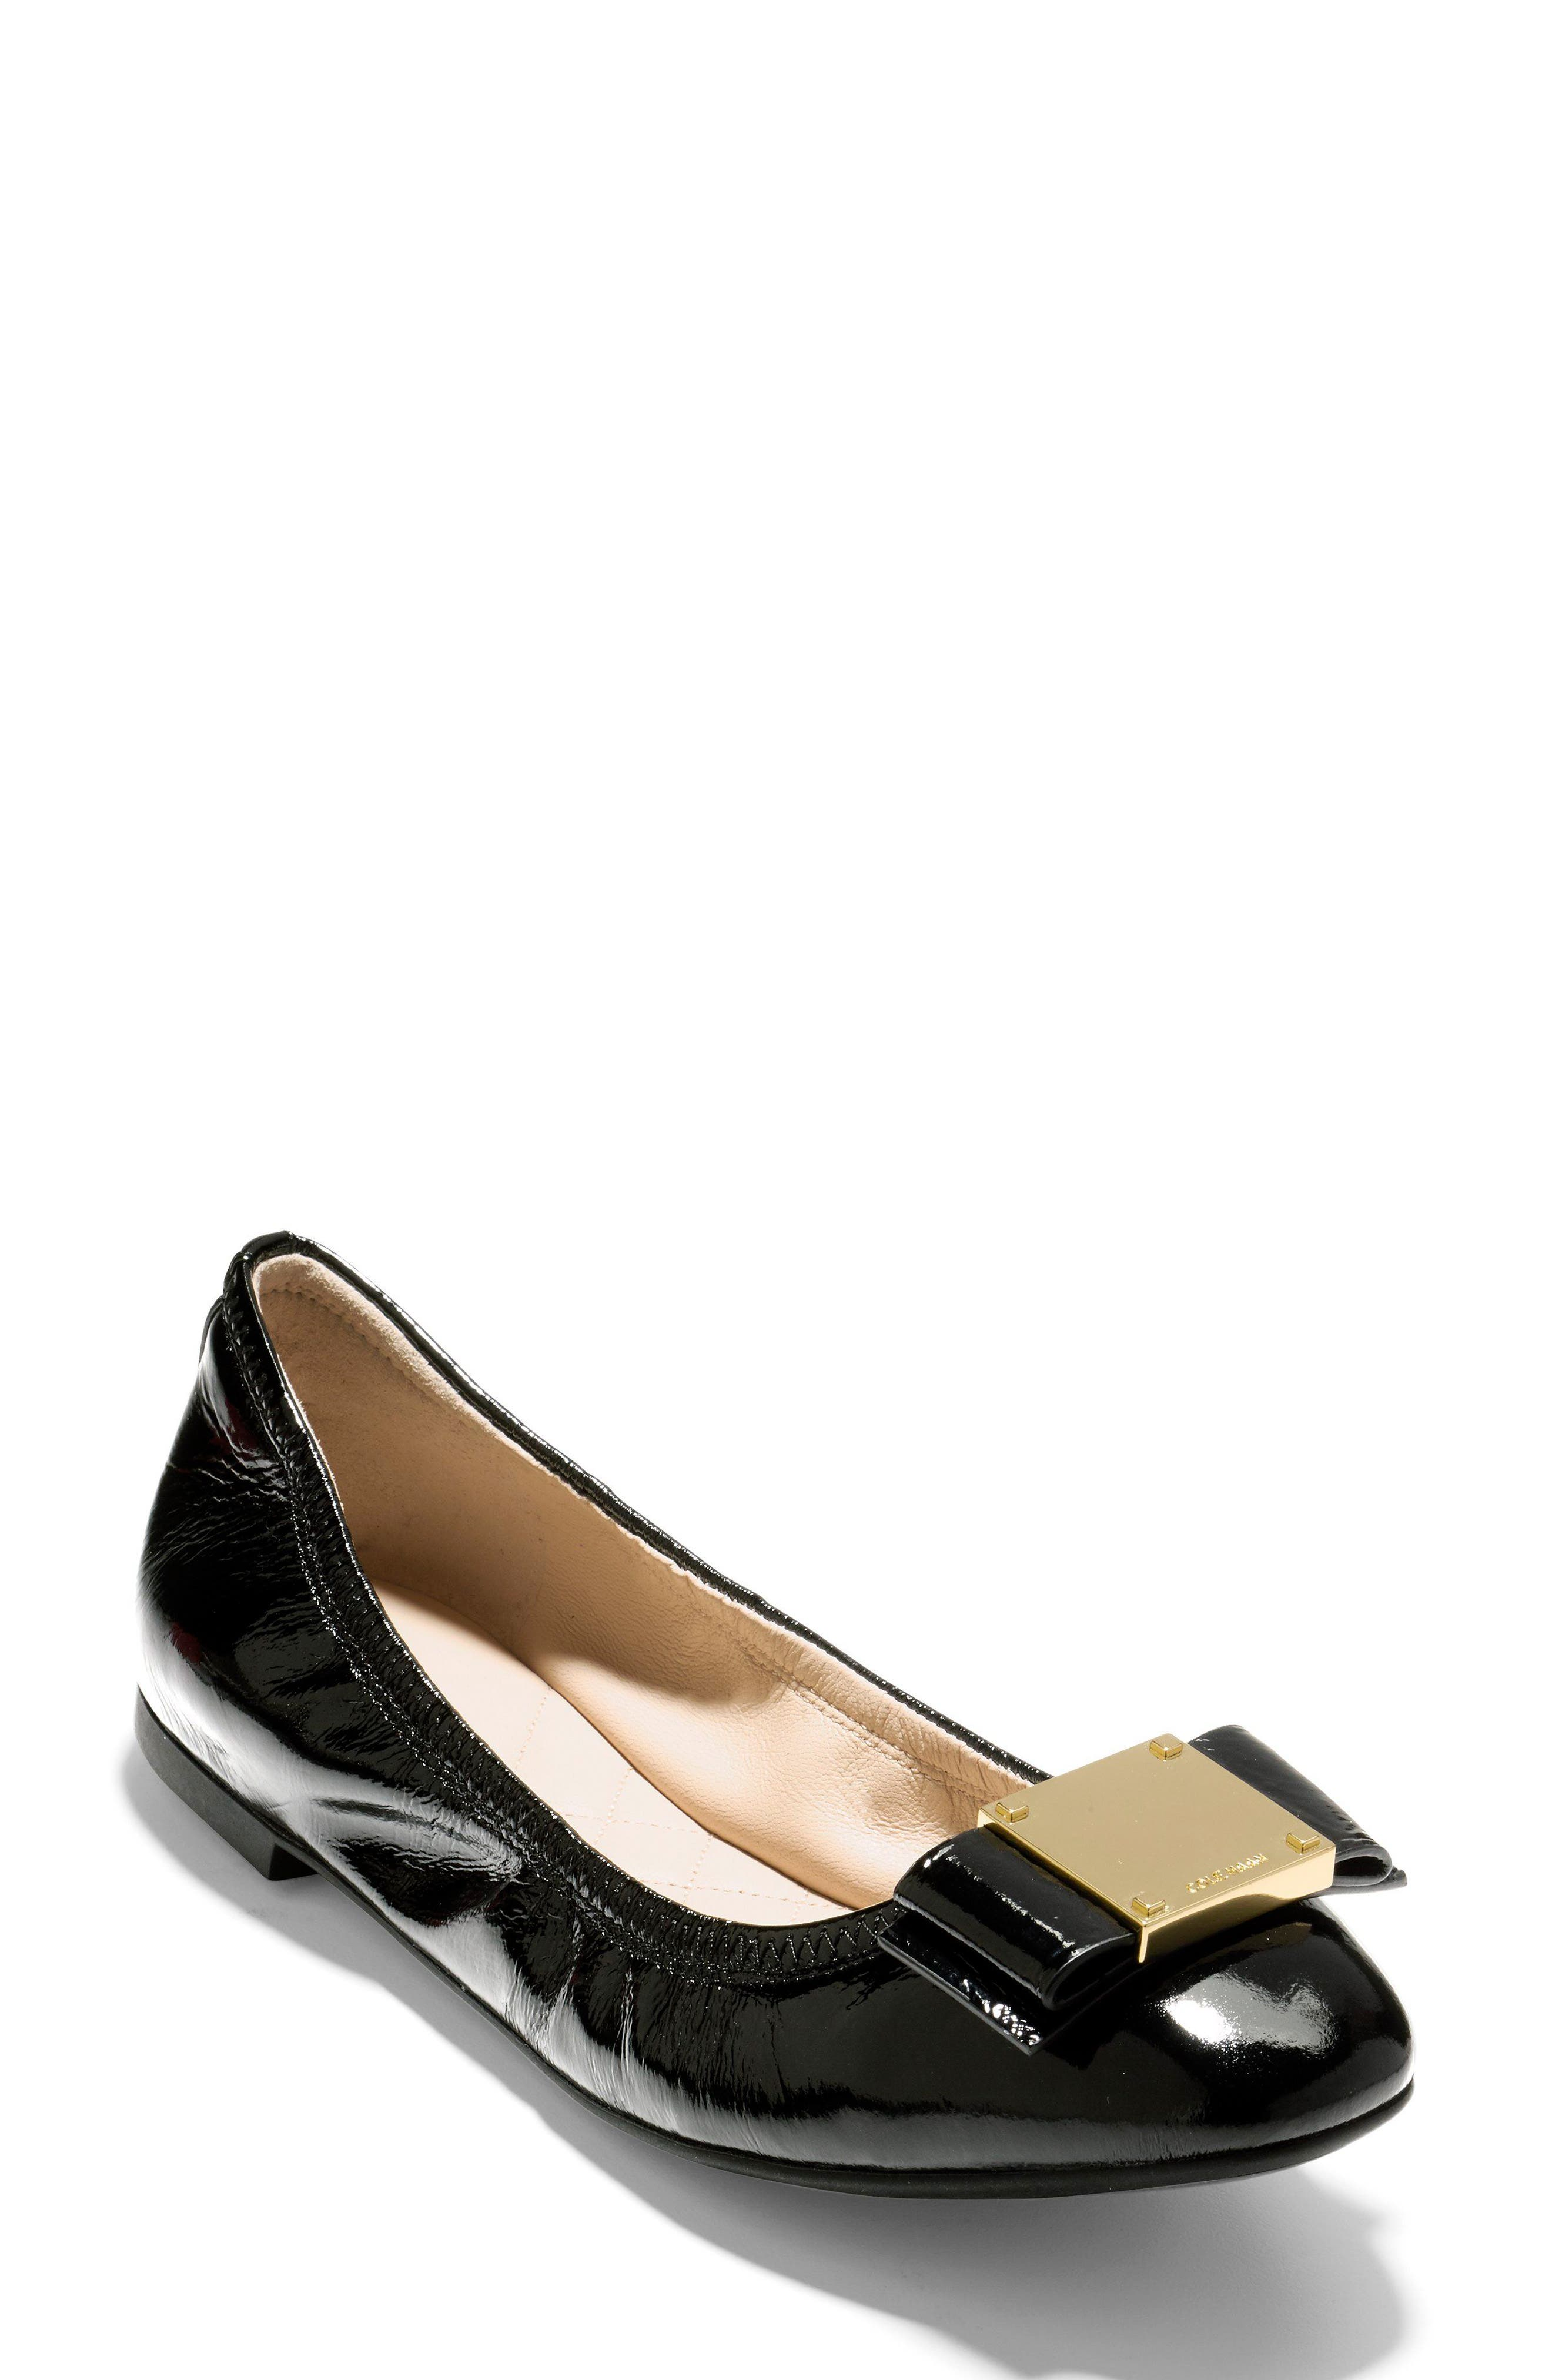 Tali Modern Bow Ballet Flat,                             Main thumbnail 1, color,                             Black Patent